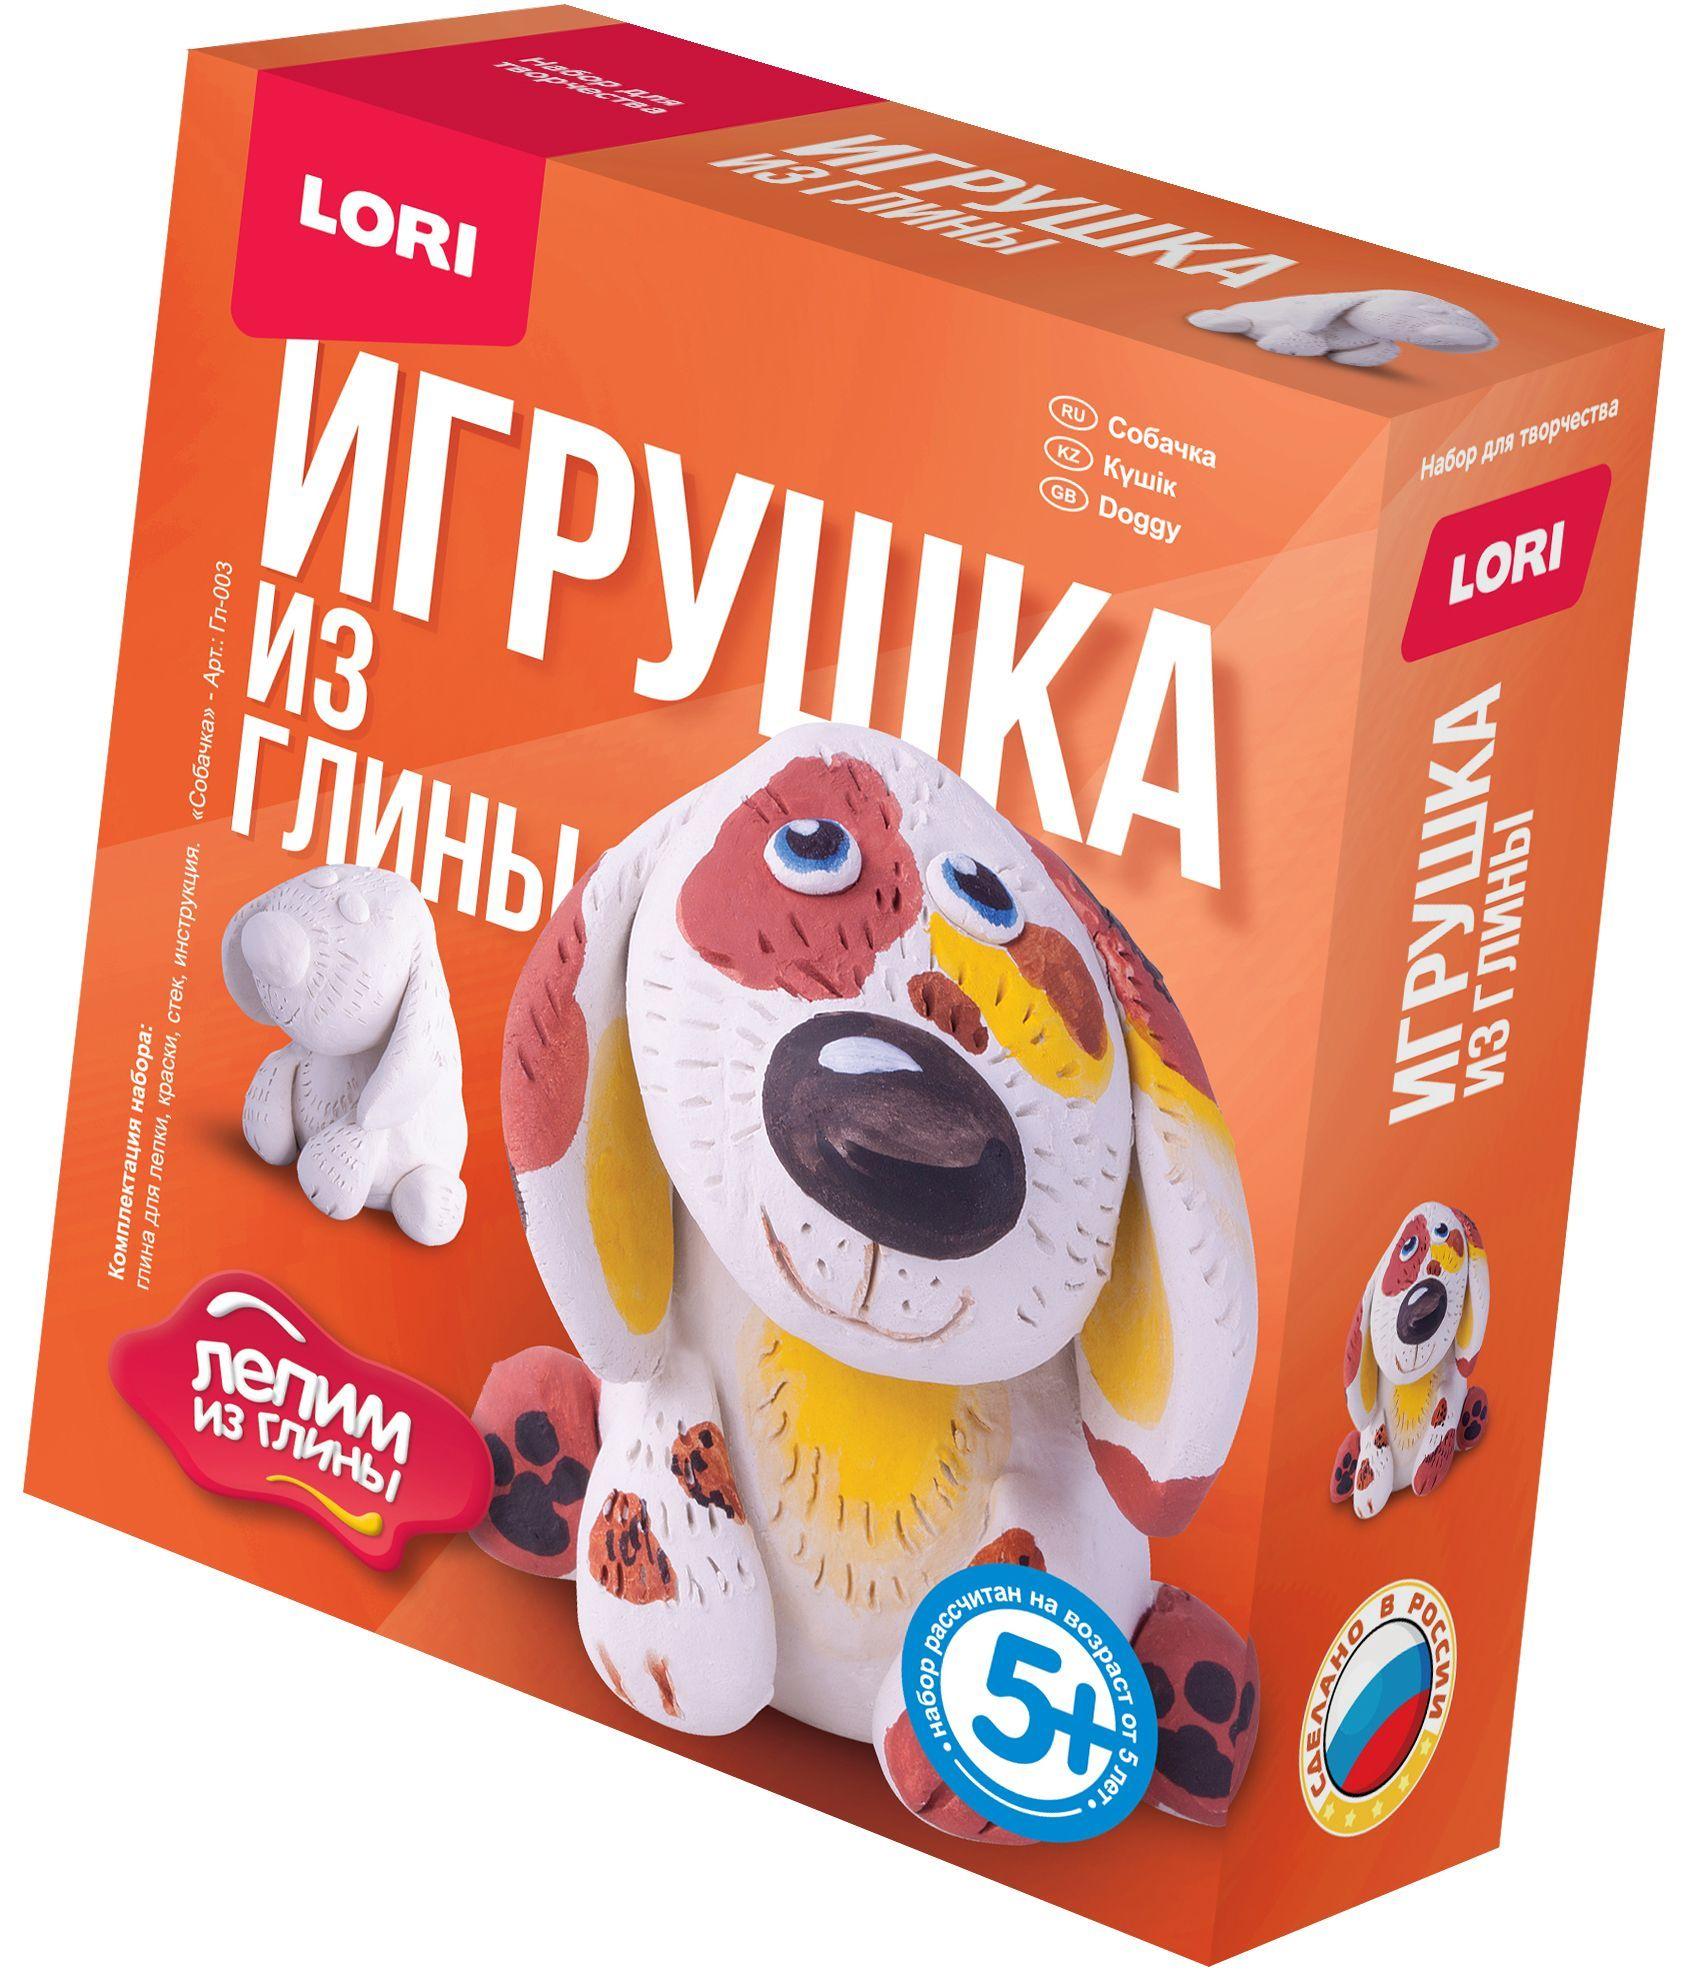 Набор д/тв. игрушка из глины СОБАЧКА